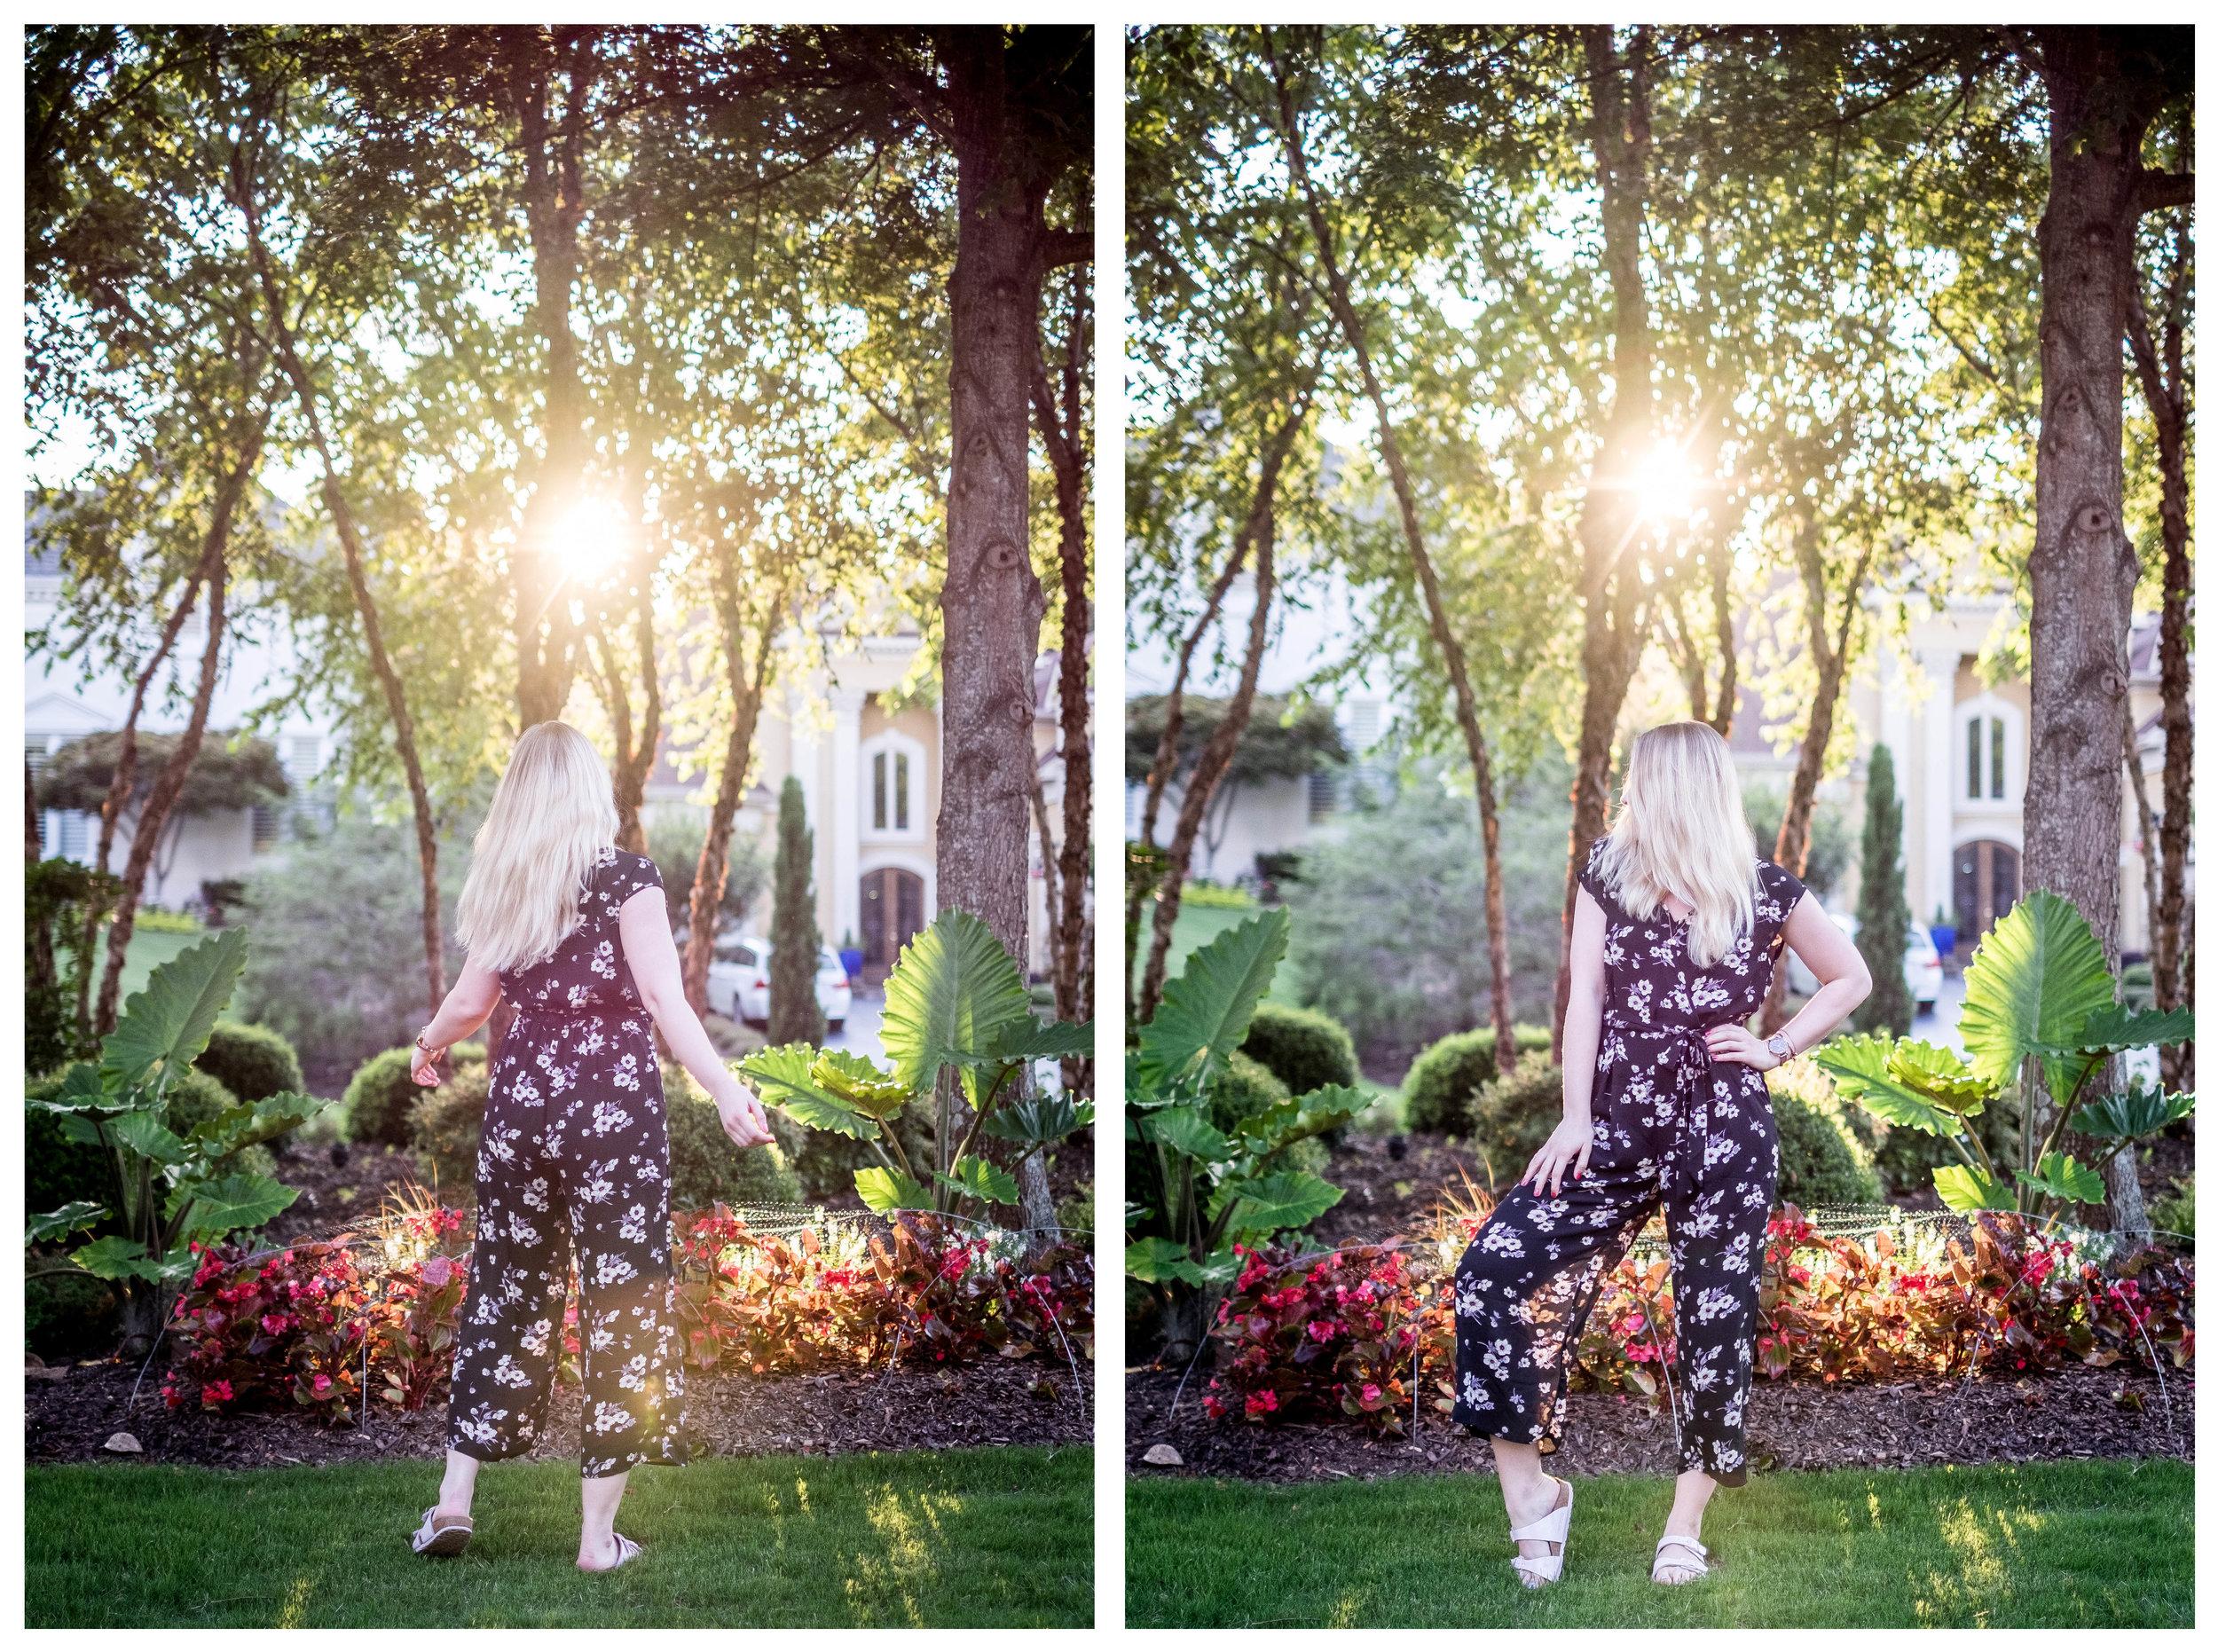 Flower jumpsuit Olivia Vranjes 103.jpg